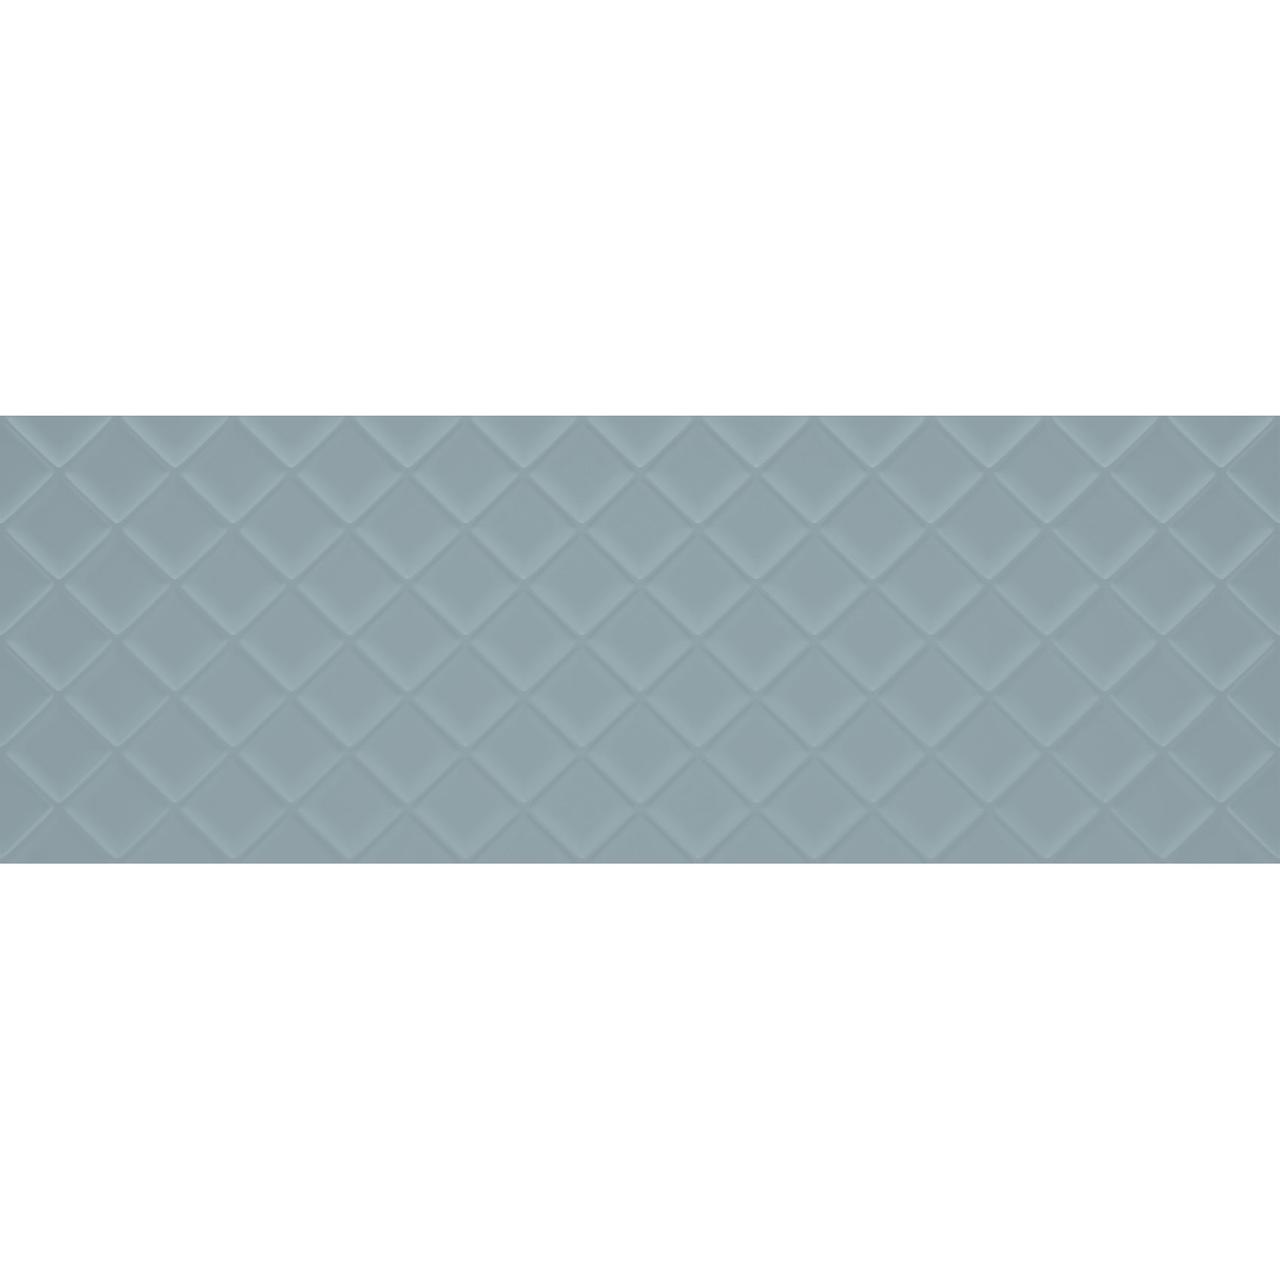 Плитка облицовочная APE Ceramica Cloud ULTRA TURQUOISE RECT